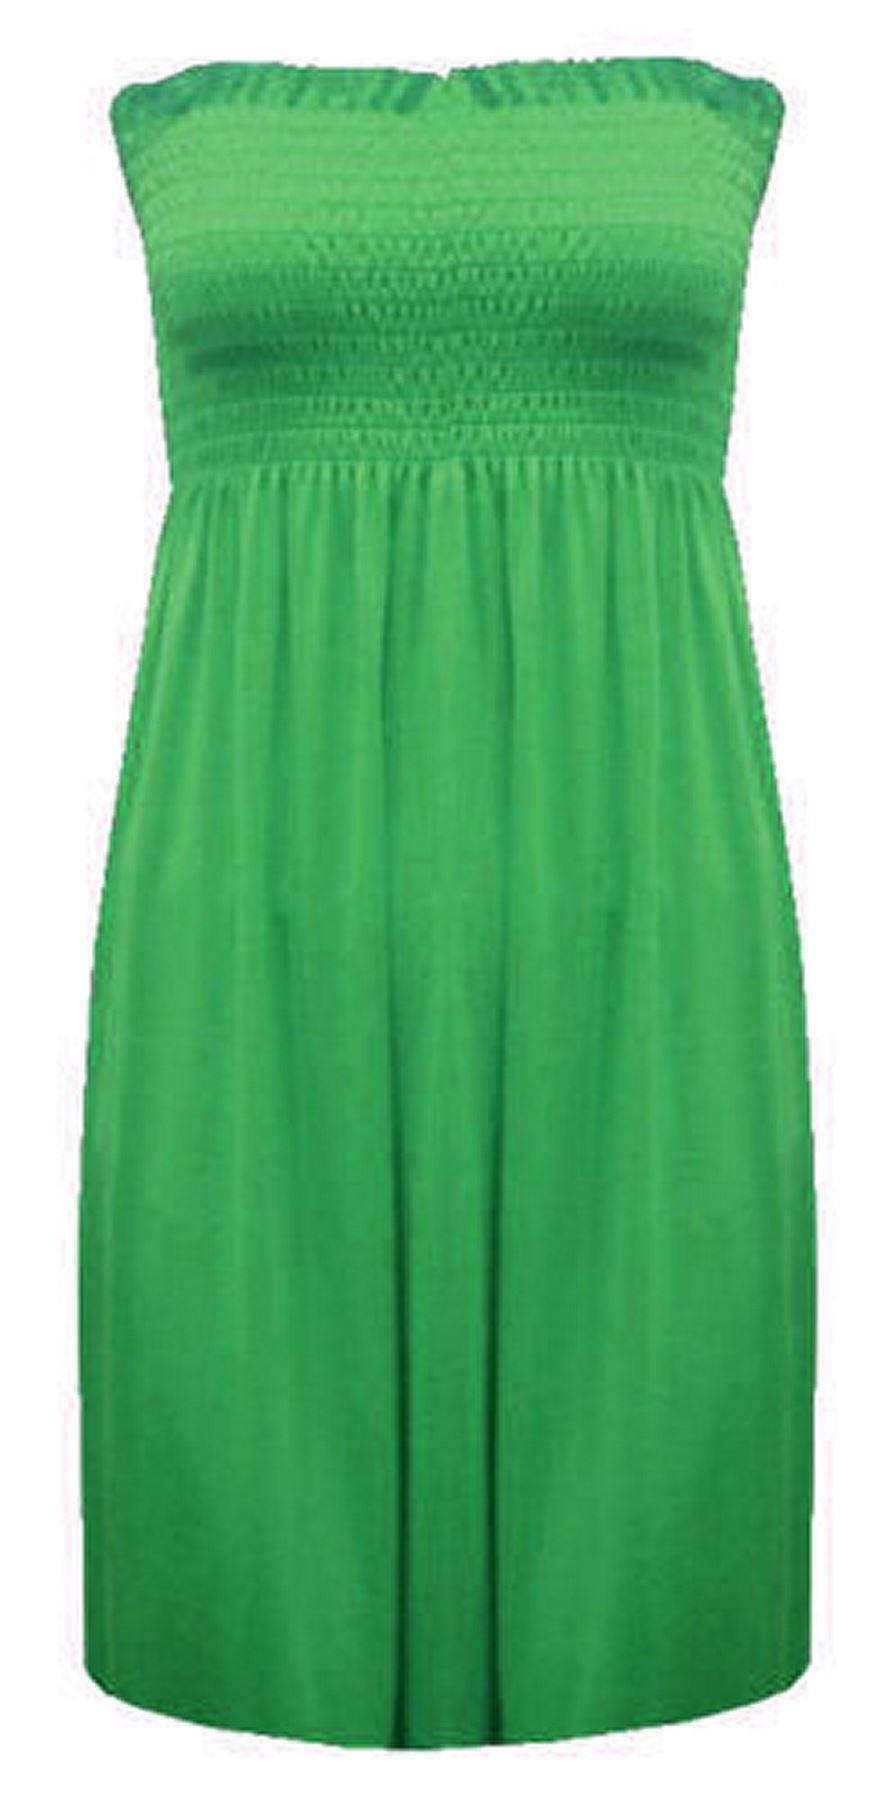 New-Ladies-Bandeau-Boob-Gathering-Tops-Boob-Tube-Beach-Wear-Tunics-8-26 thumbnail 36